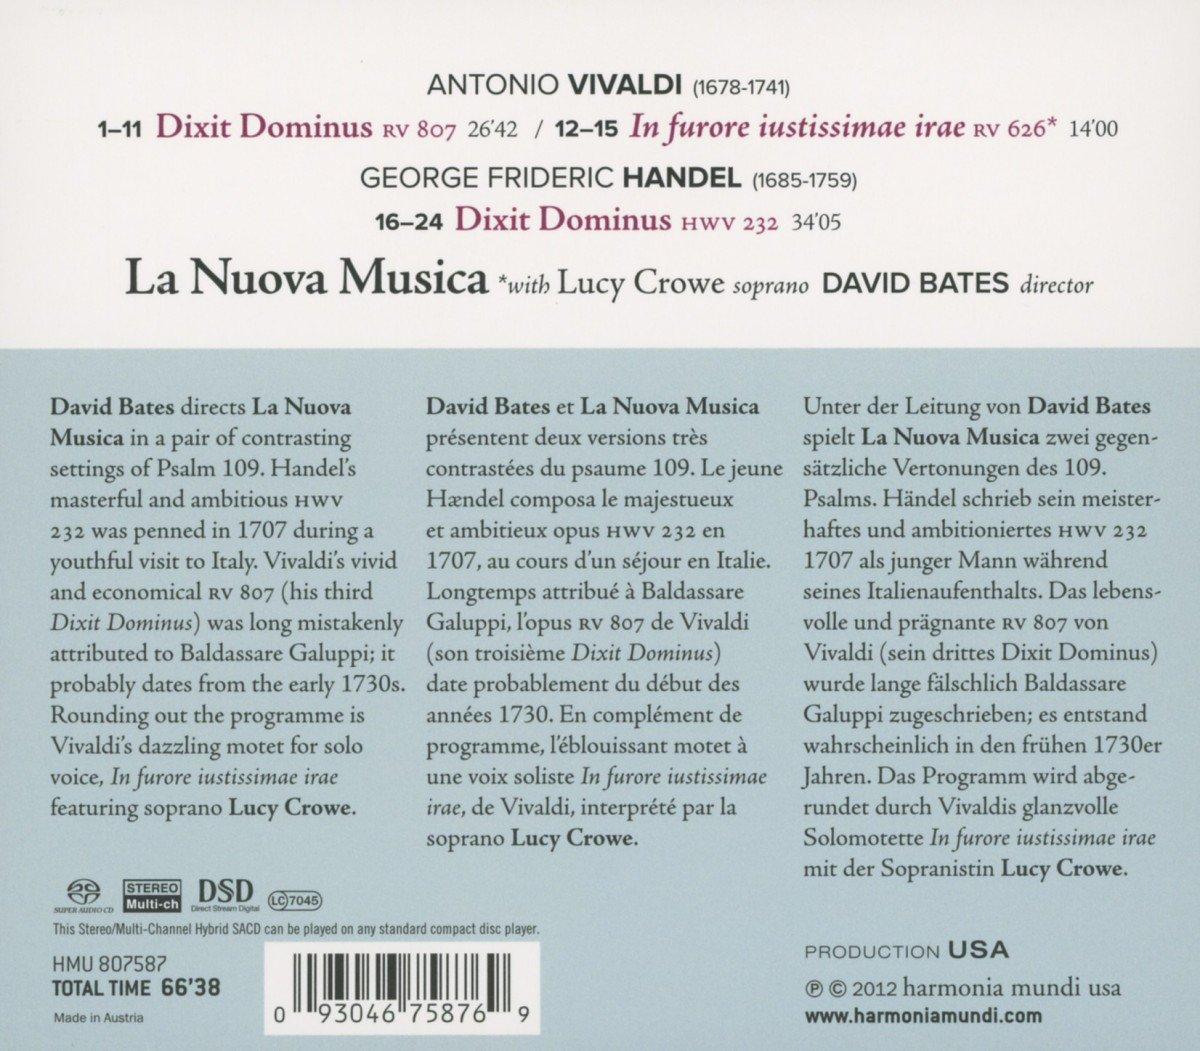 Dixit Dominus : La Nuova Musica, Handel: Amazon.es: Música